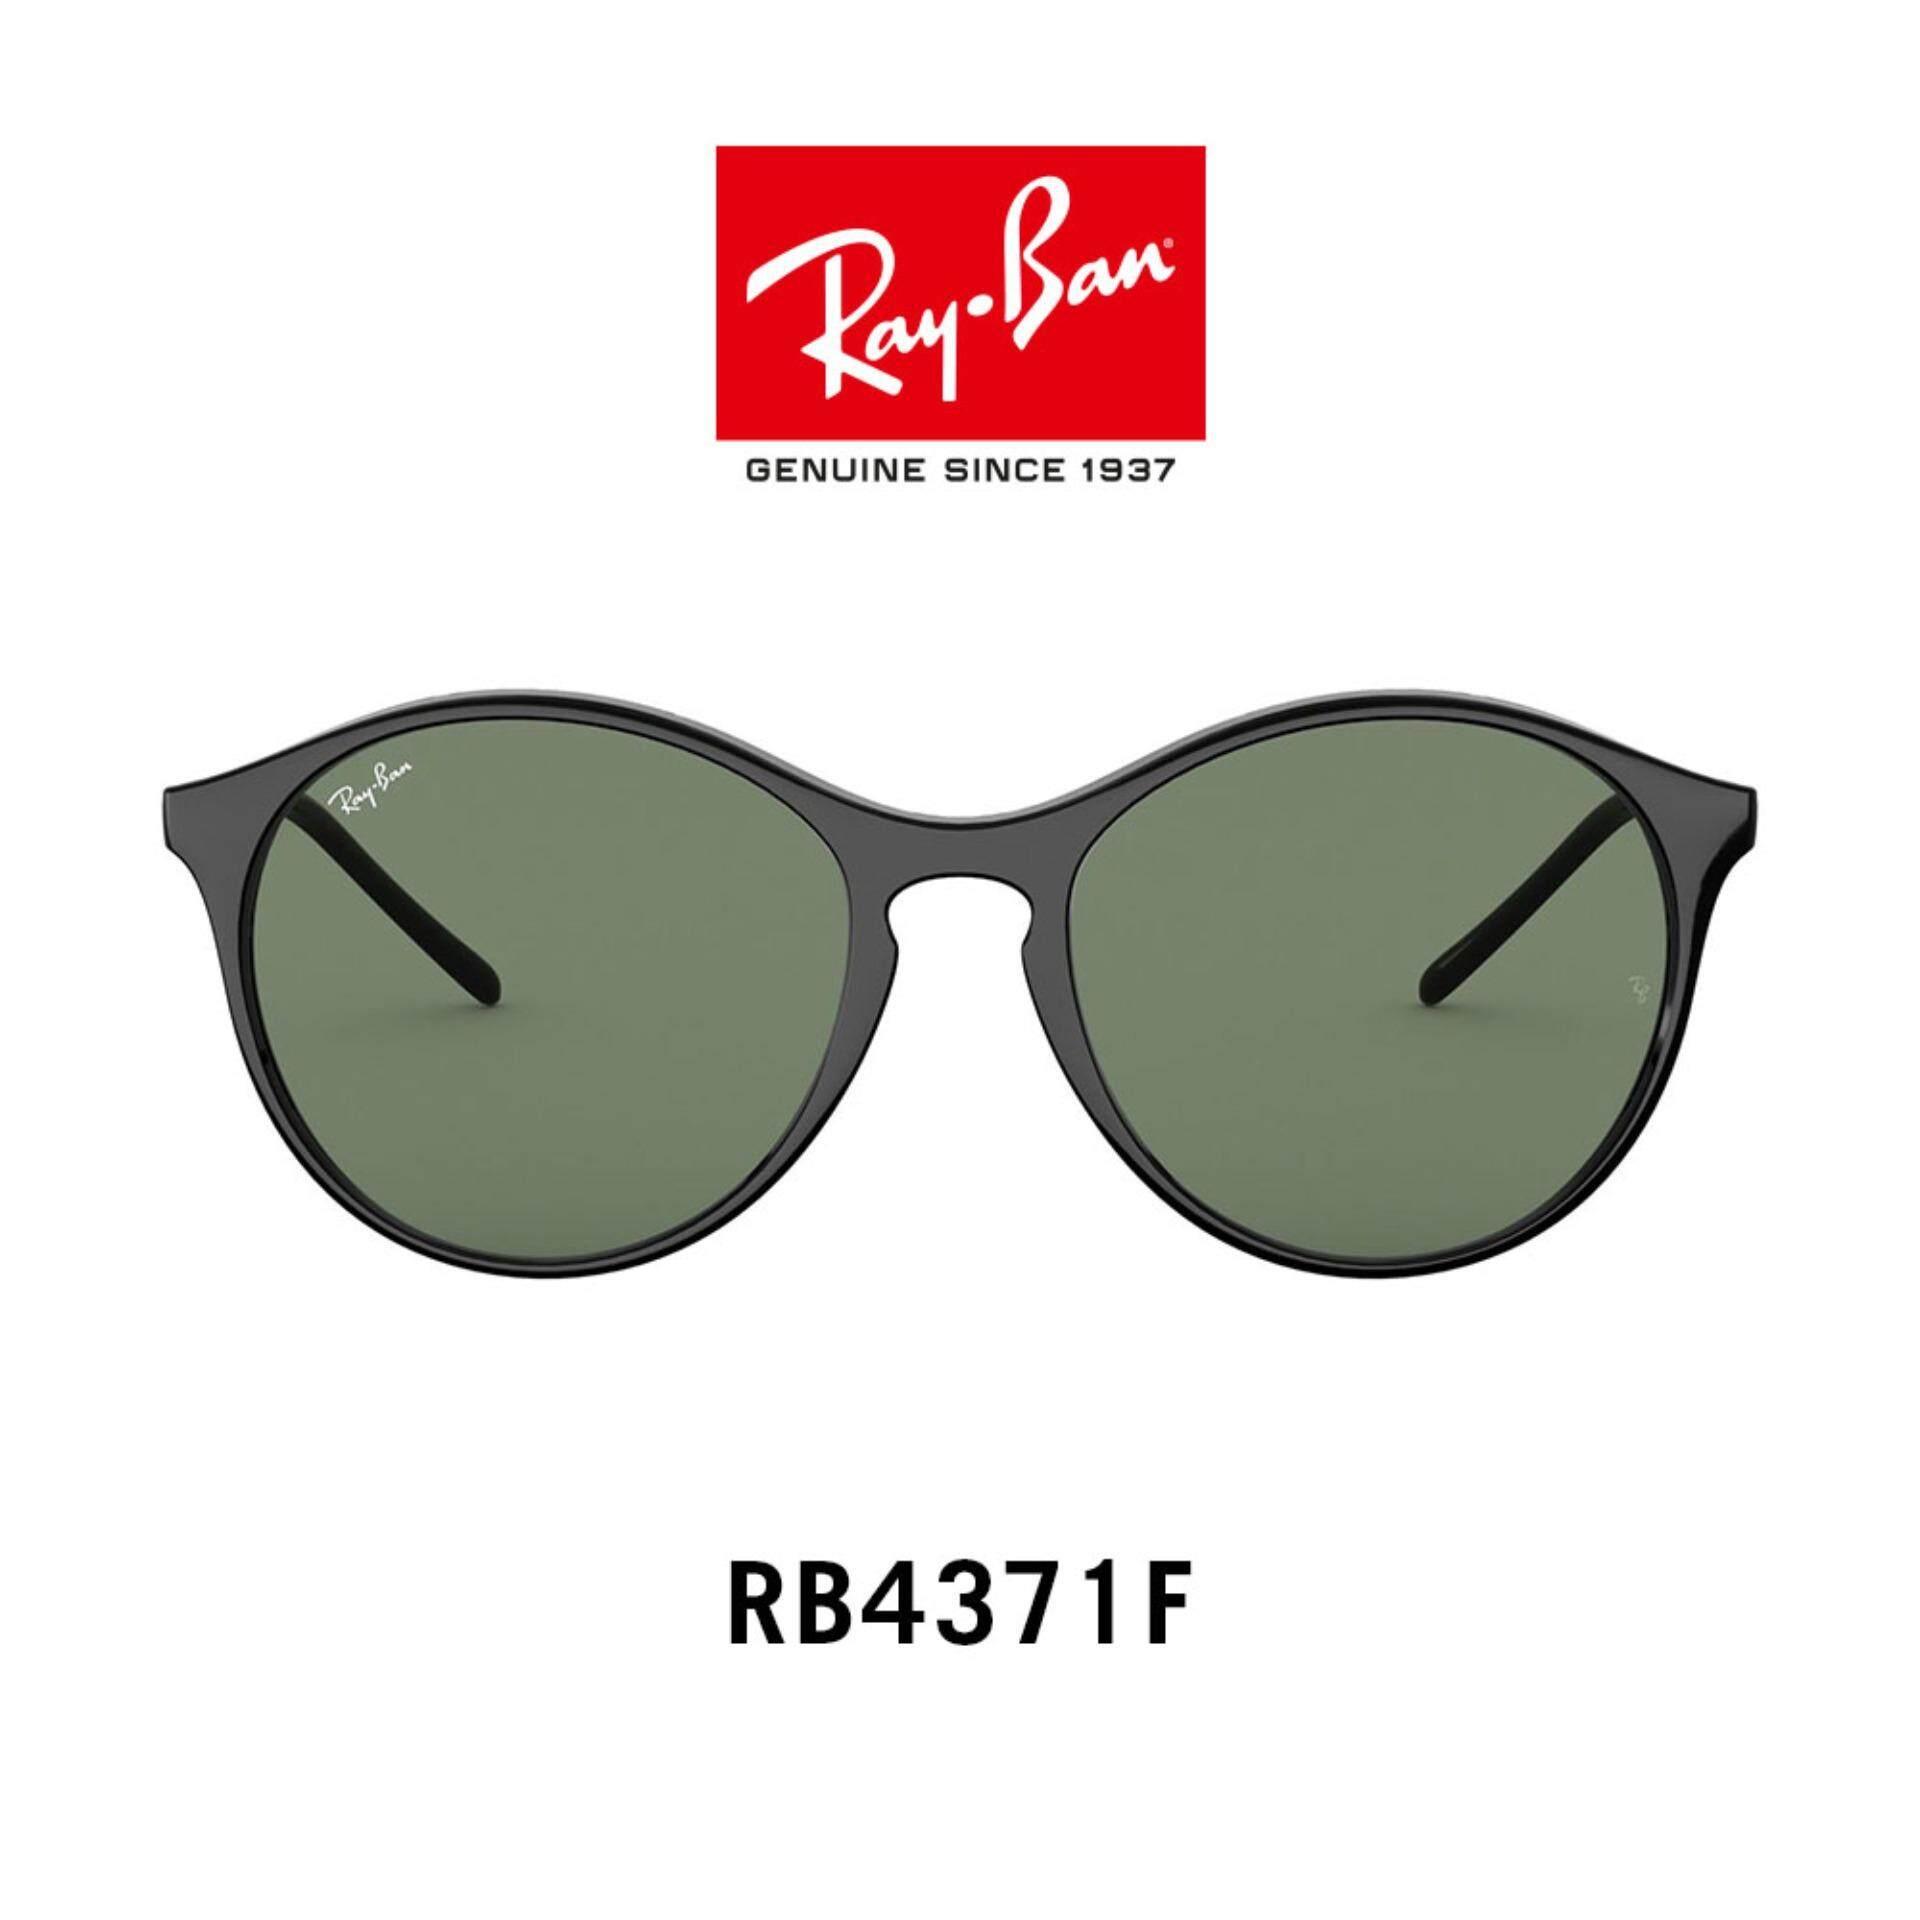 Ray-Ban - 0rb4371f 901/71  แว่นตากันแดด.